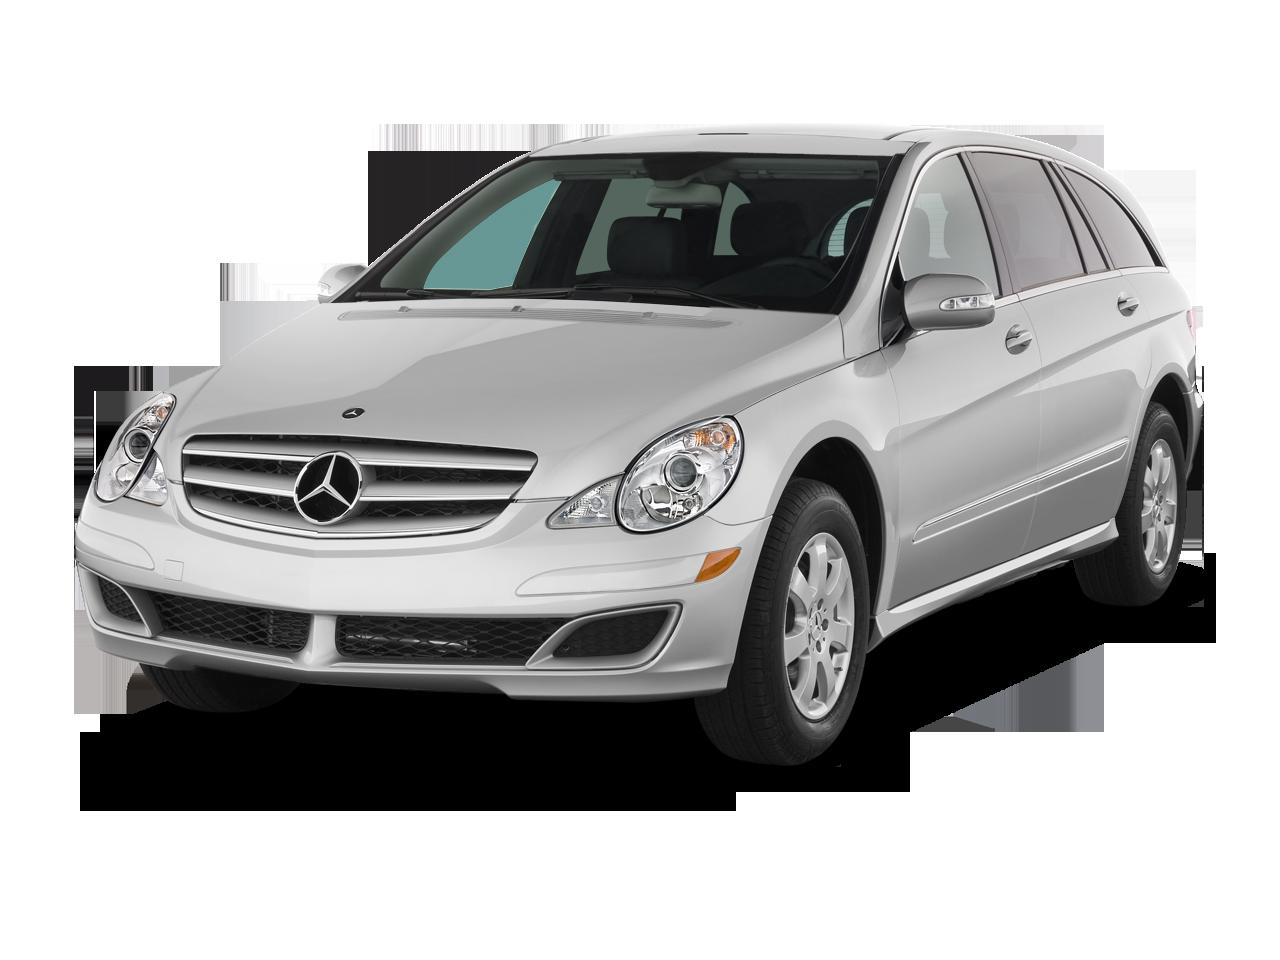 MERCEDES OEM 06-10 R350 Steering Wheel-Trim Cover 16446006959E37